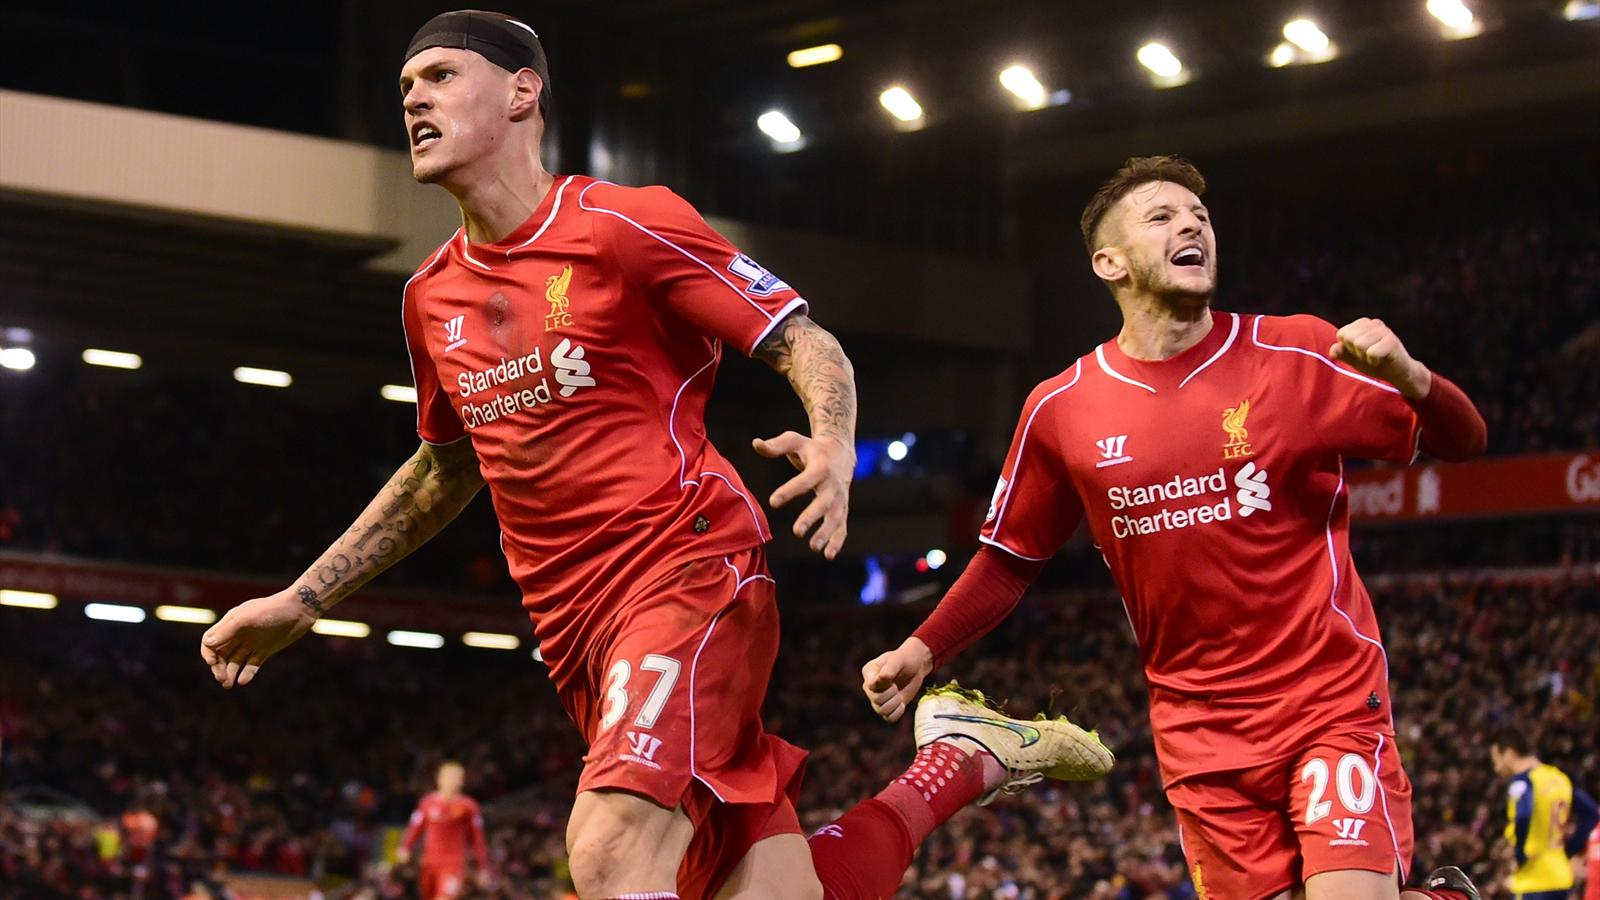 Liverpool's Slovakian defender Martin Skrtel (L) celebrates scoring his team's second equalising goal